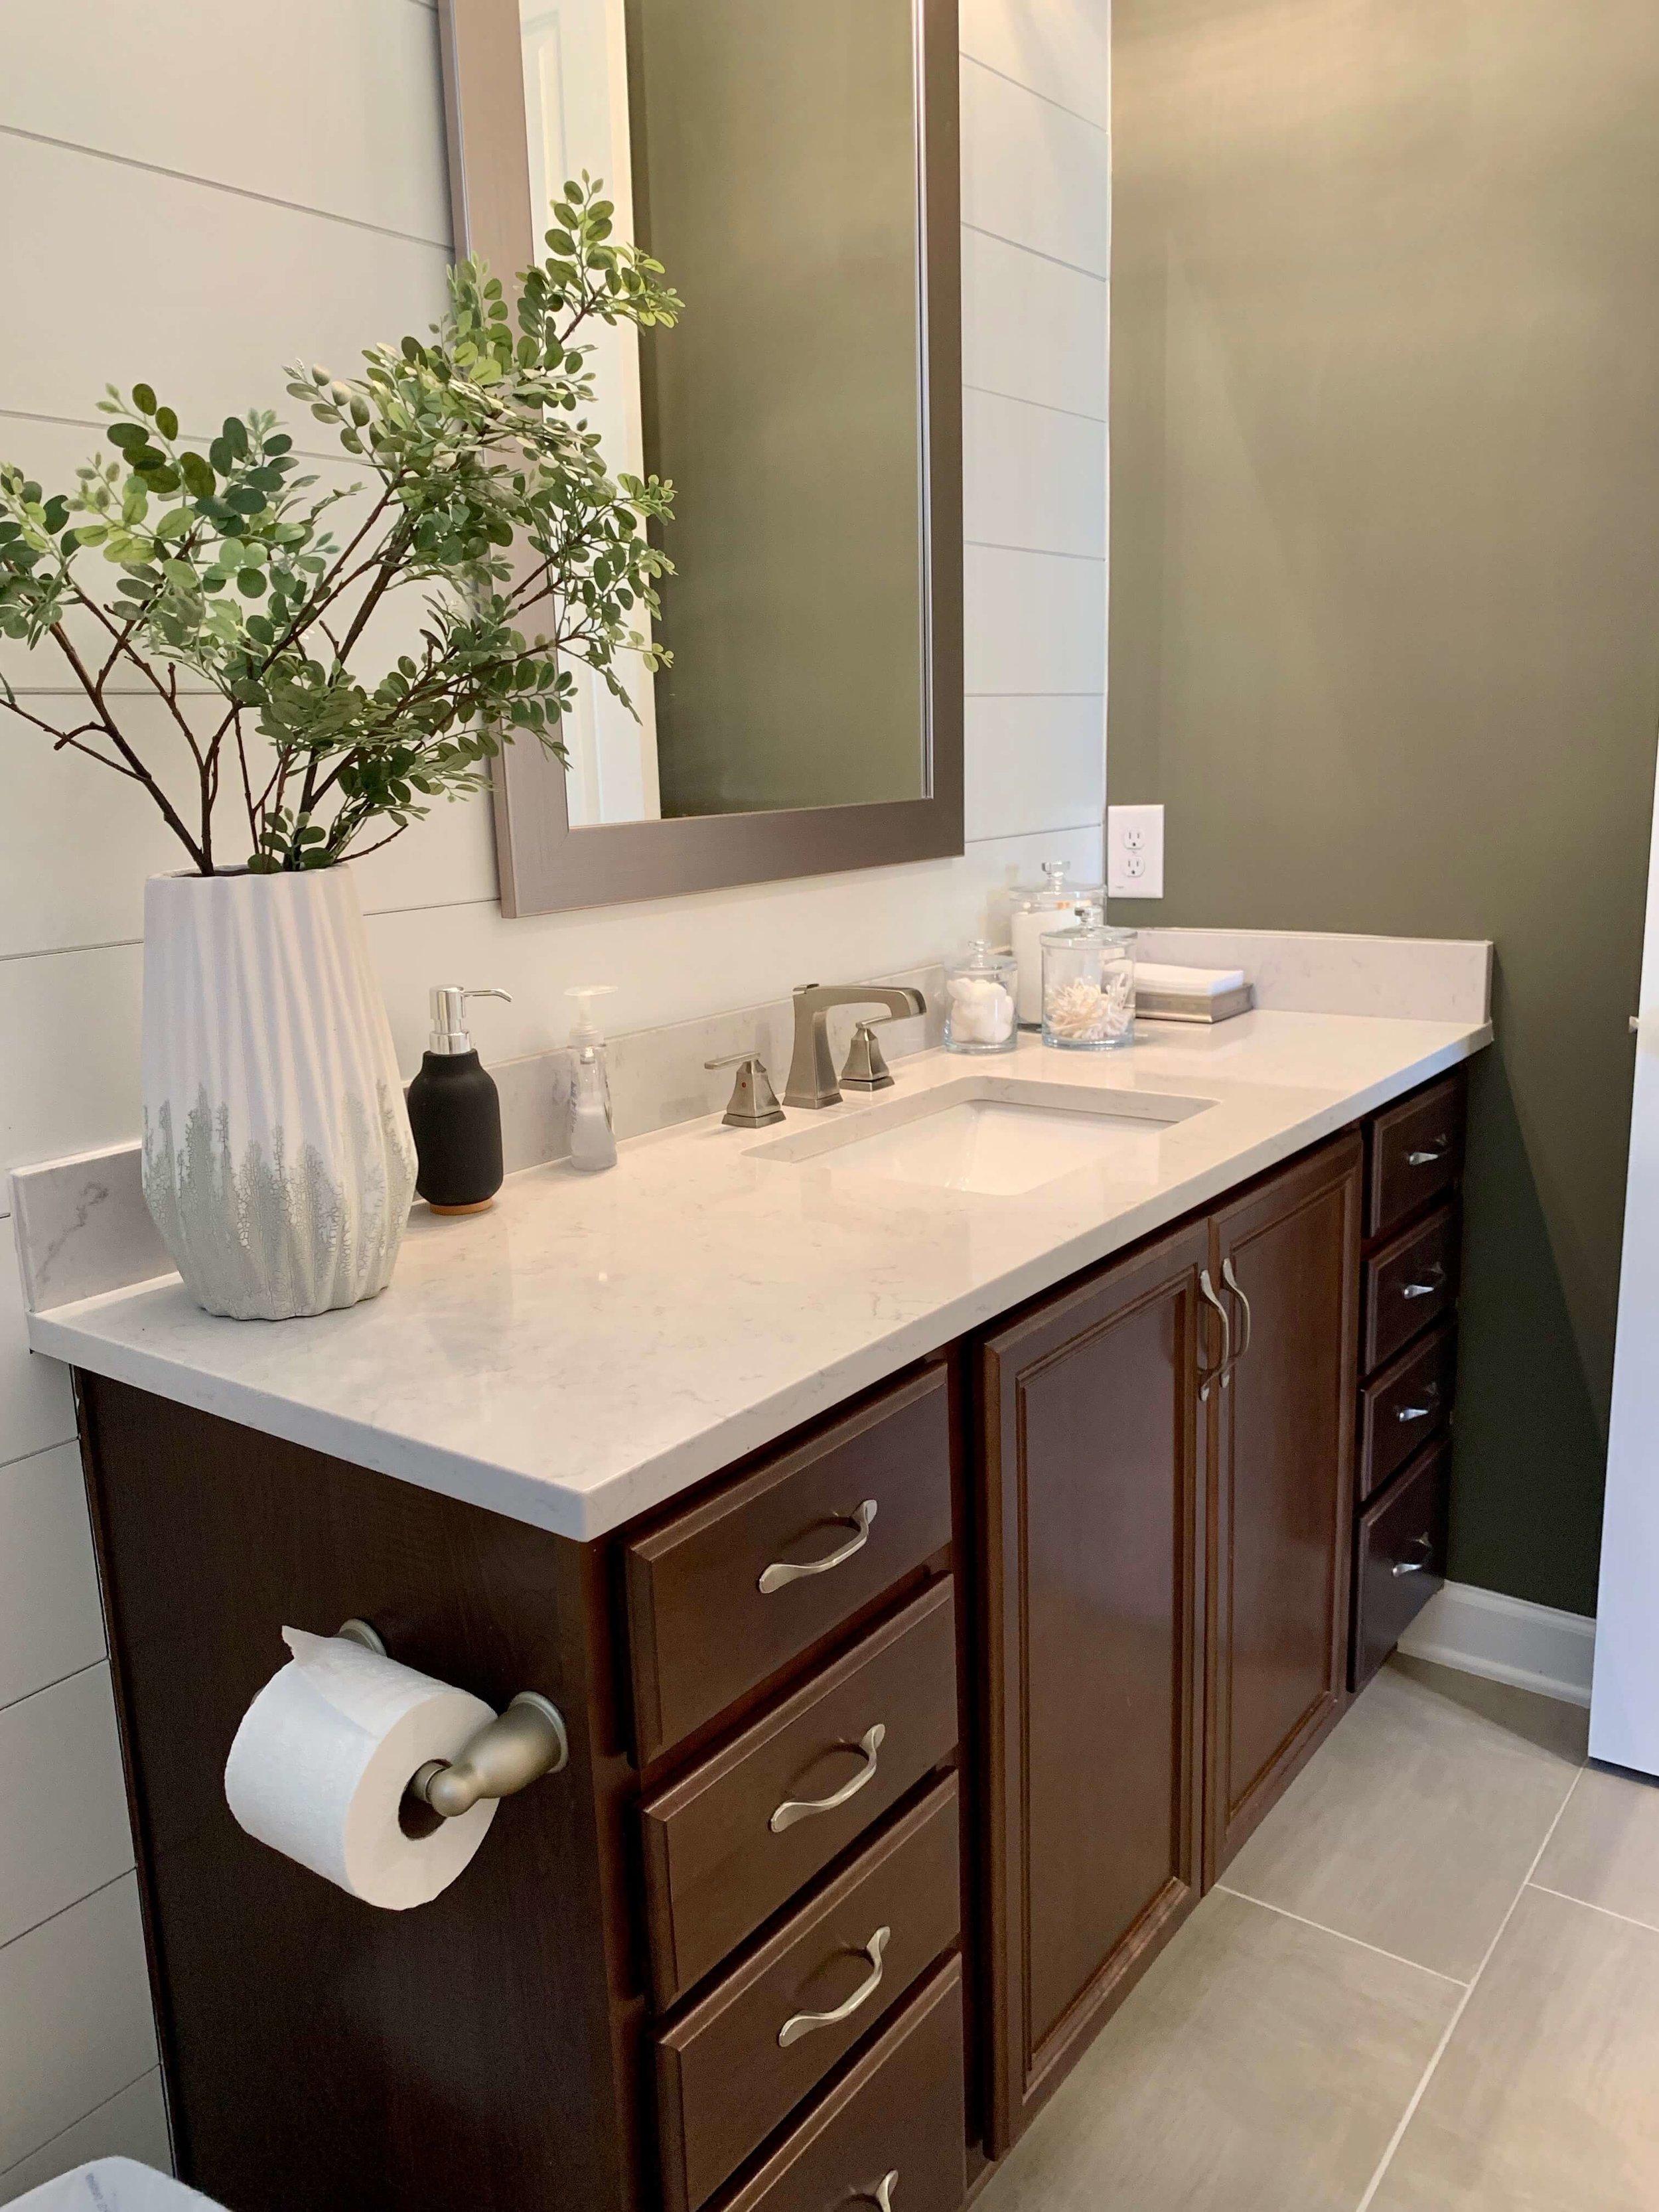 bathroom_color_model_home_ideas 2.jpeg